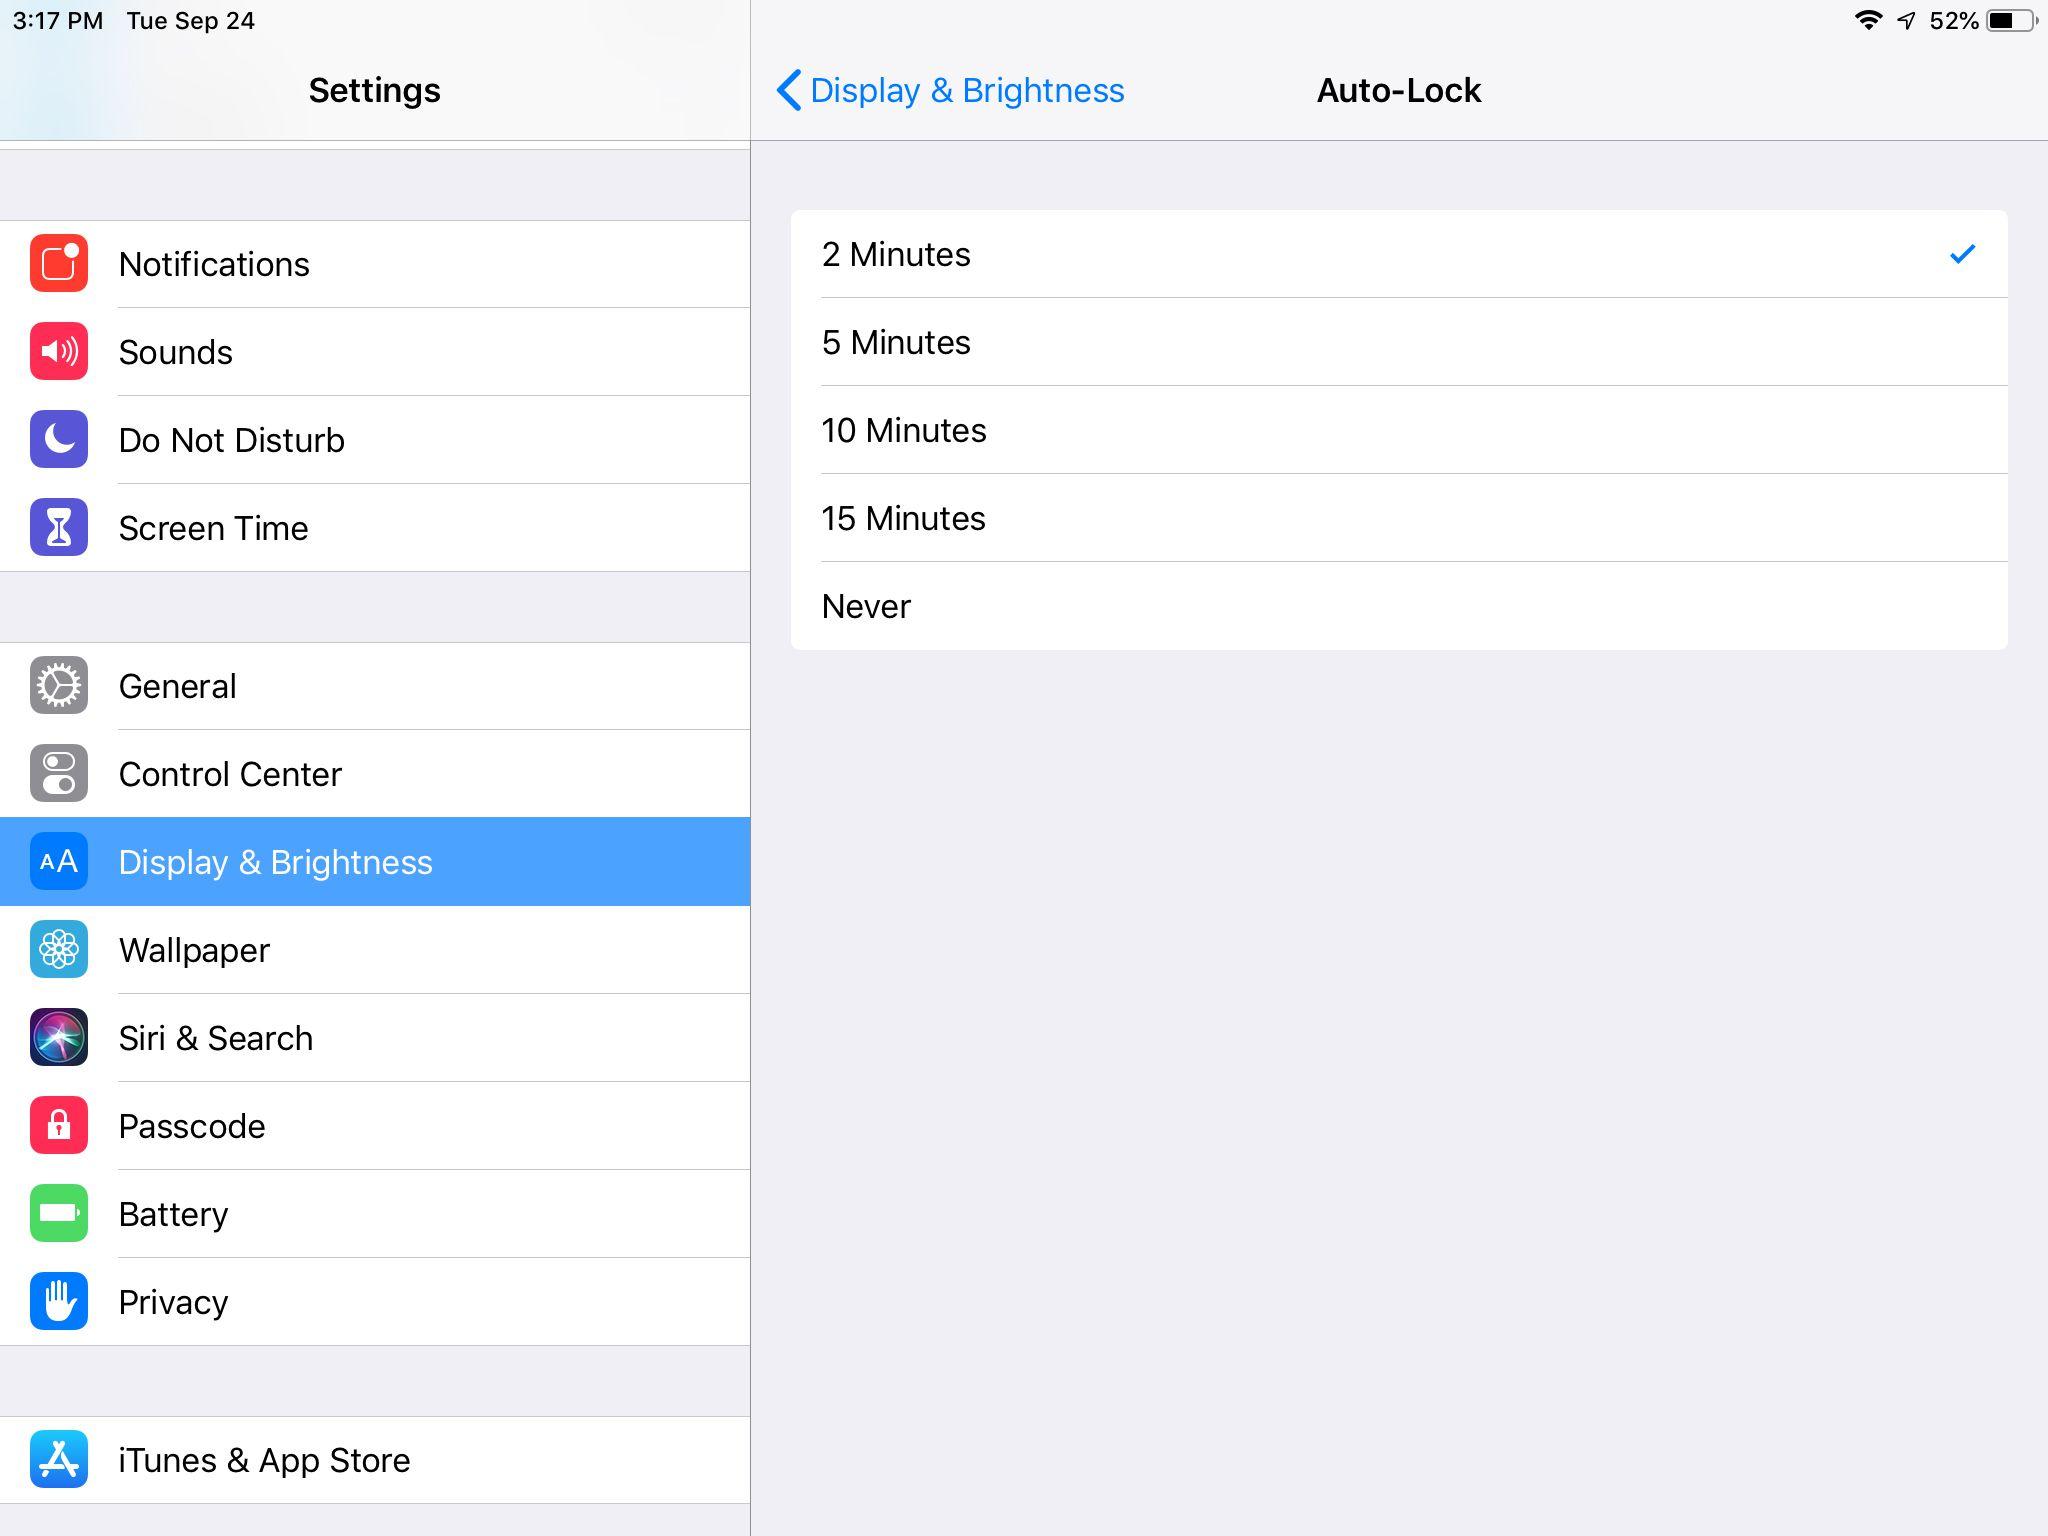 Auto-Lock options on the iPad with iOS 12